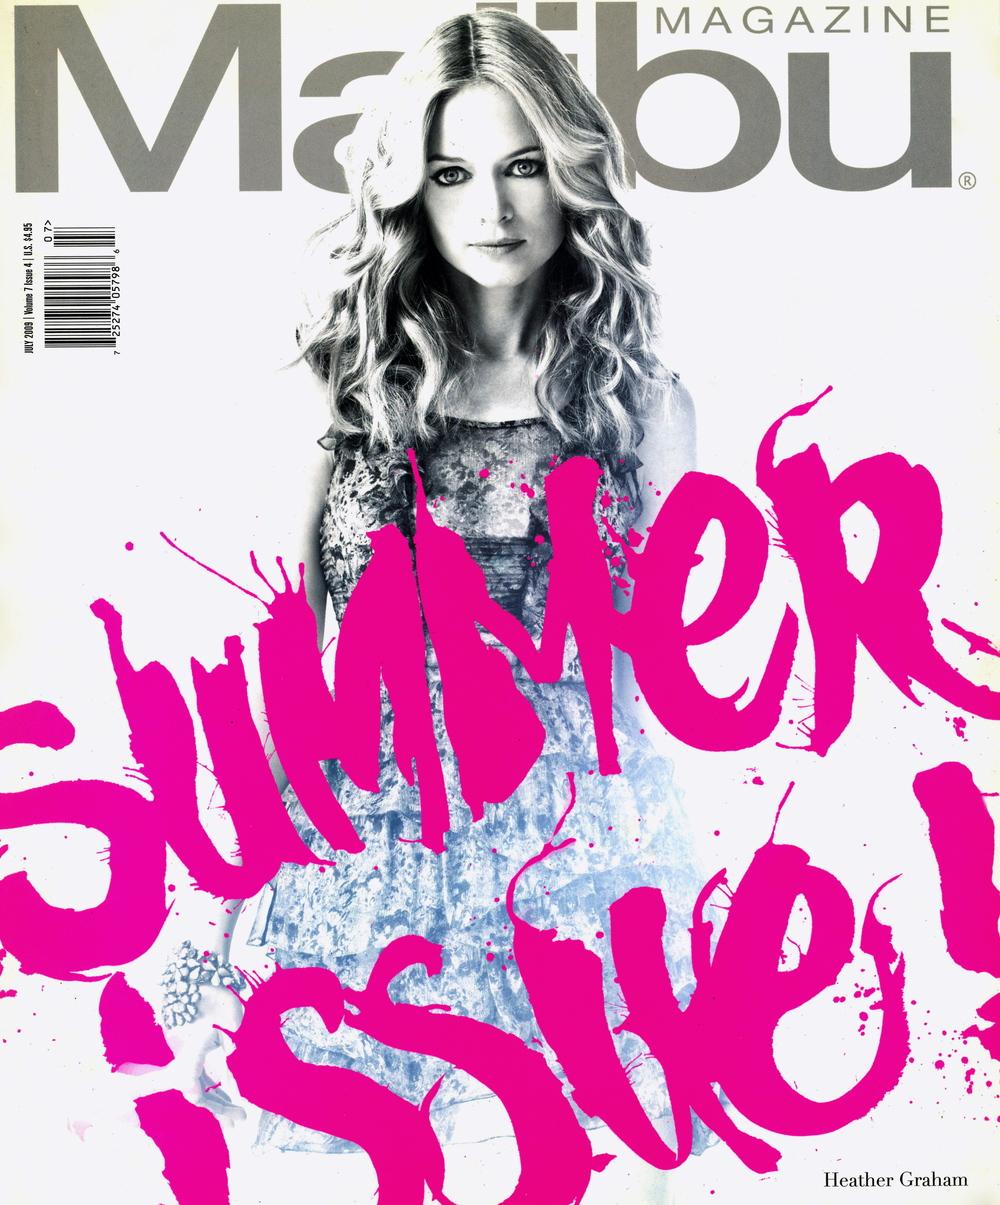 Malibu magazine_July 2009_cover.jpg